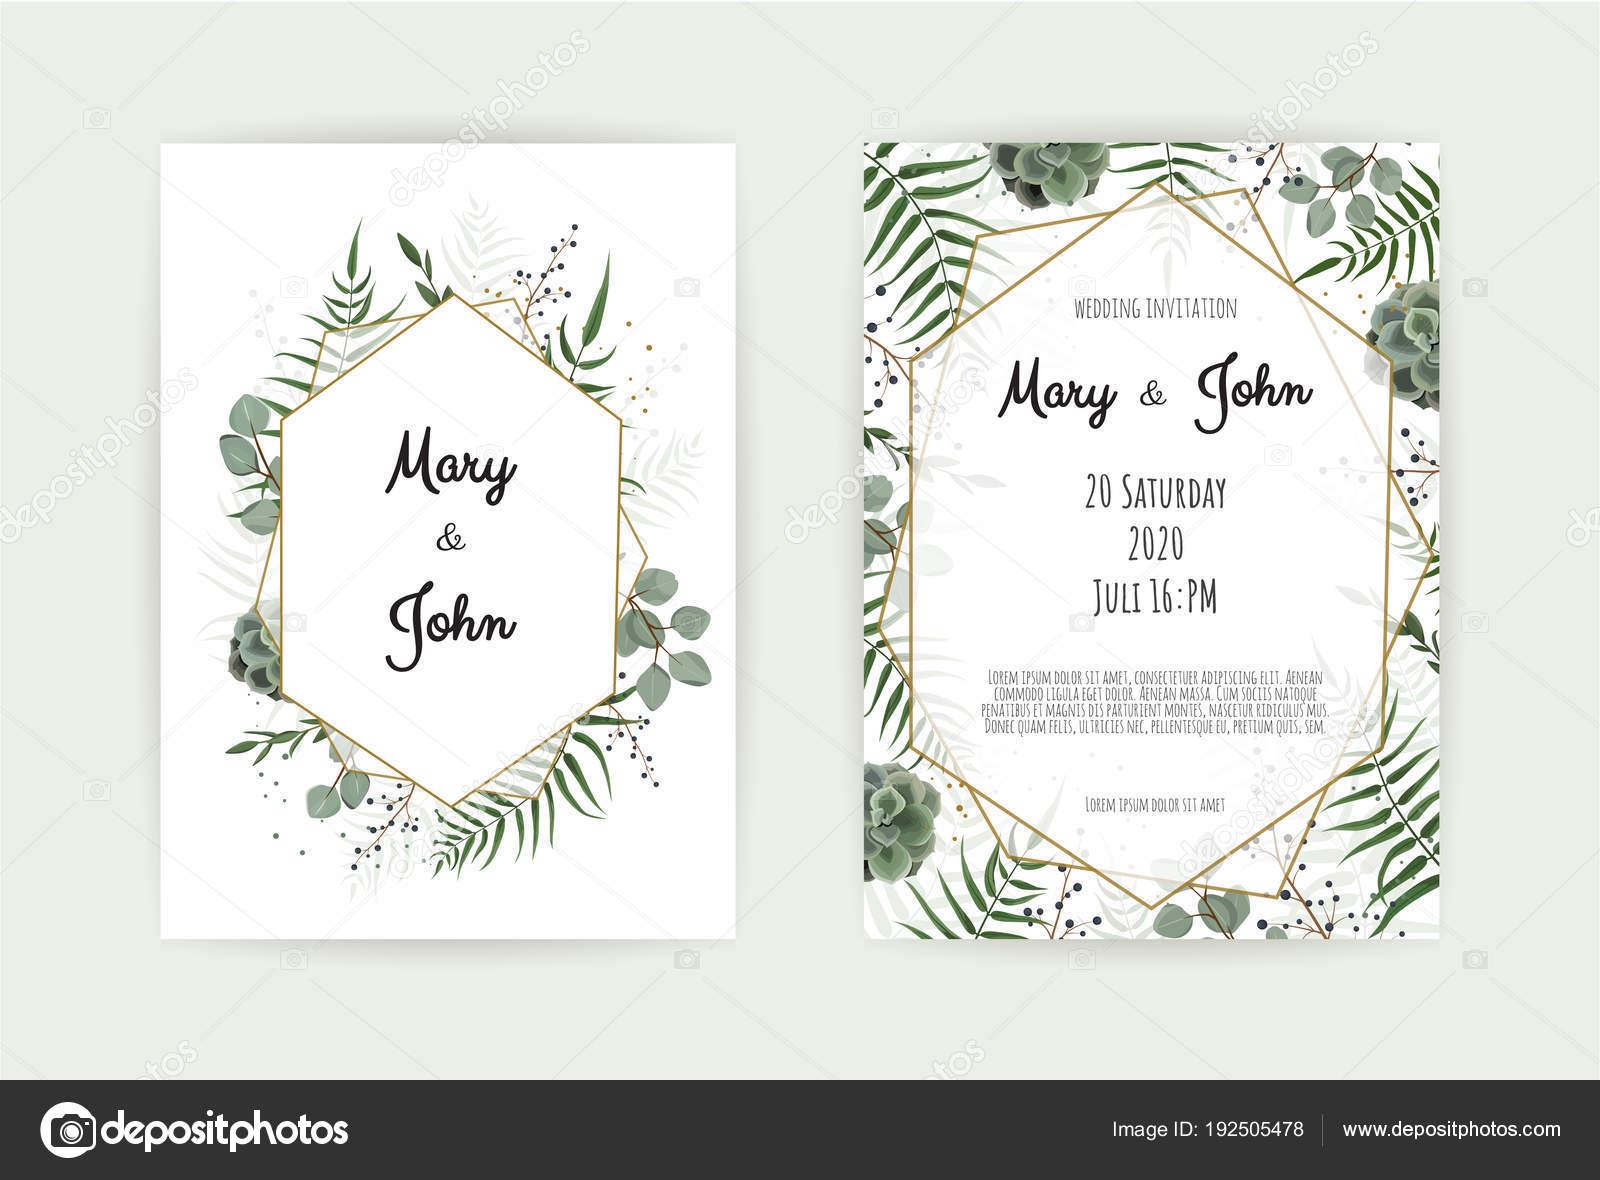 vector illustration design natural botanical wedding invitation